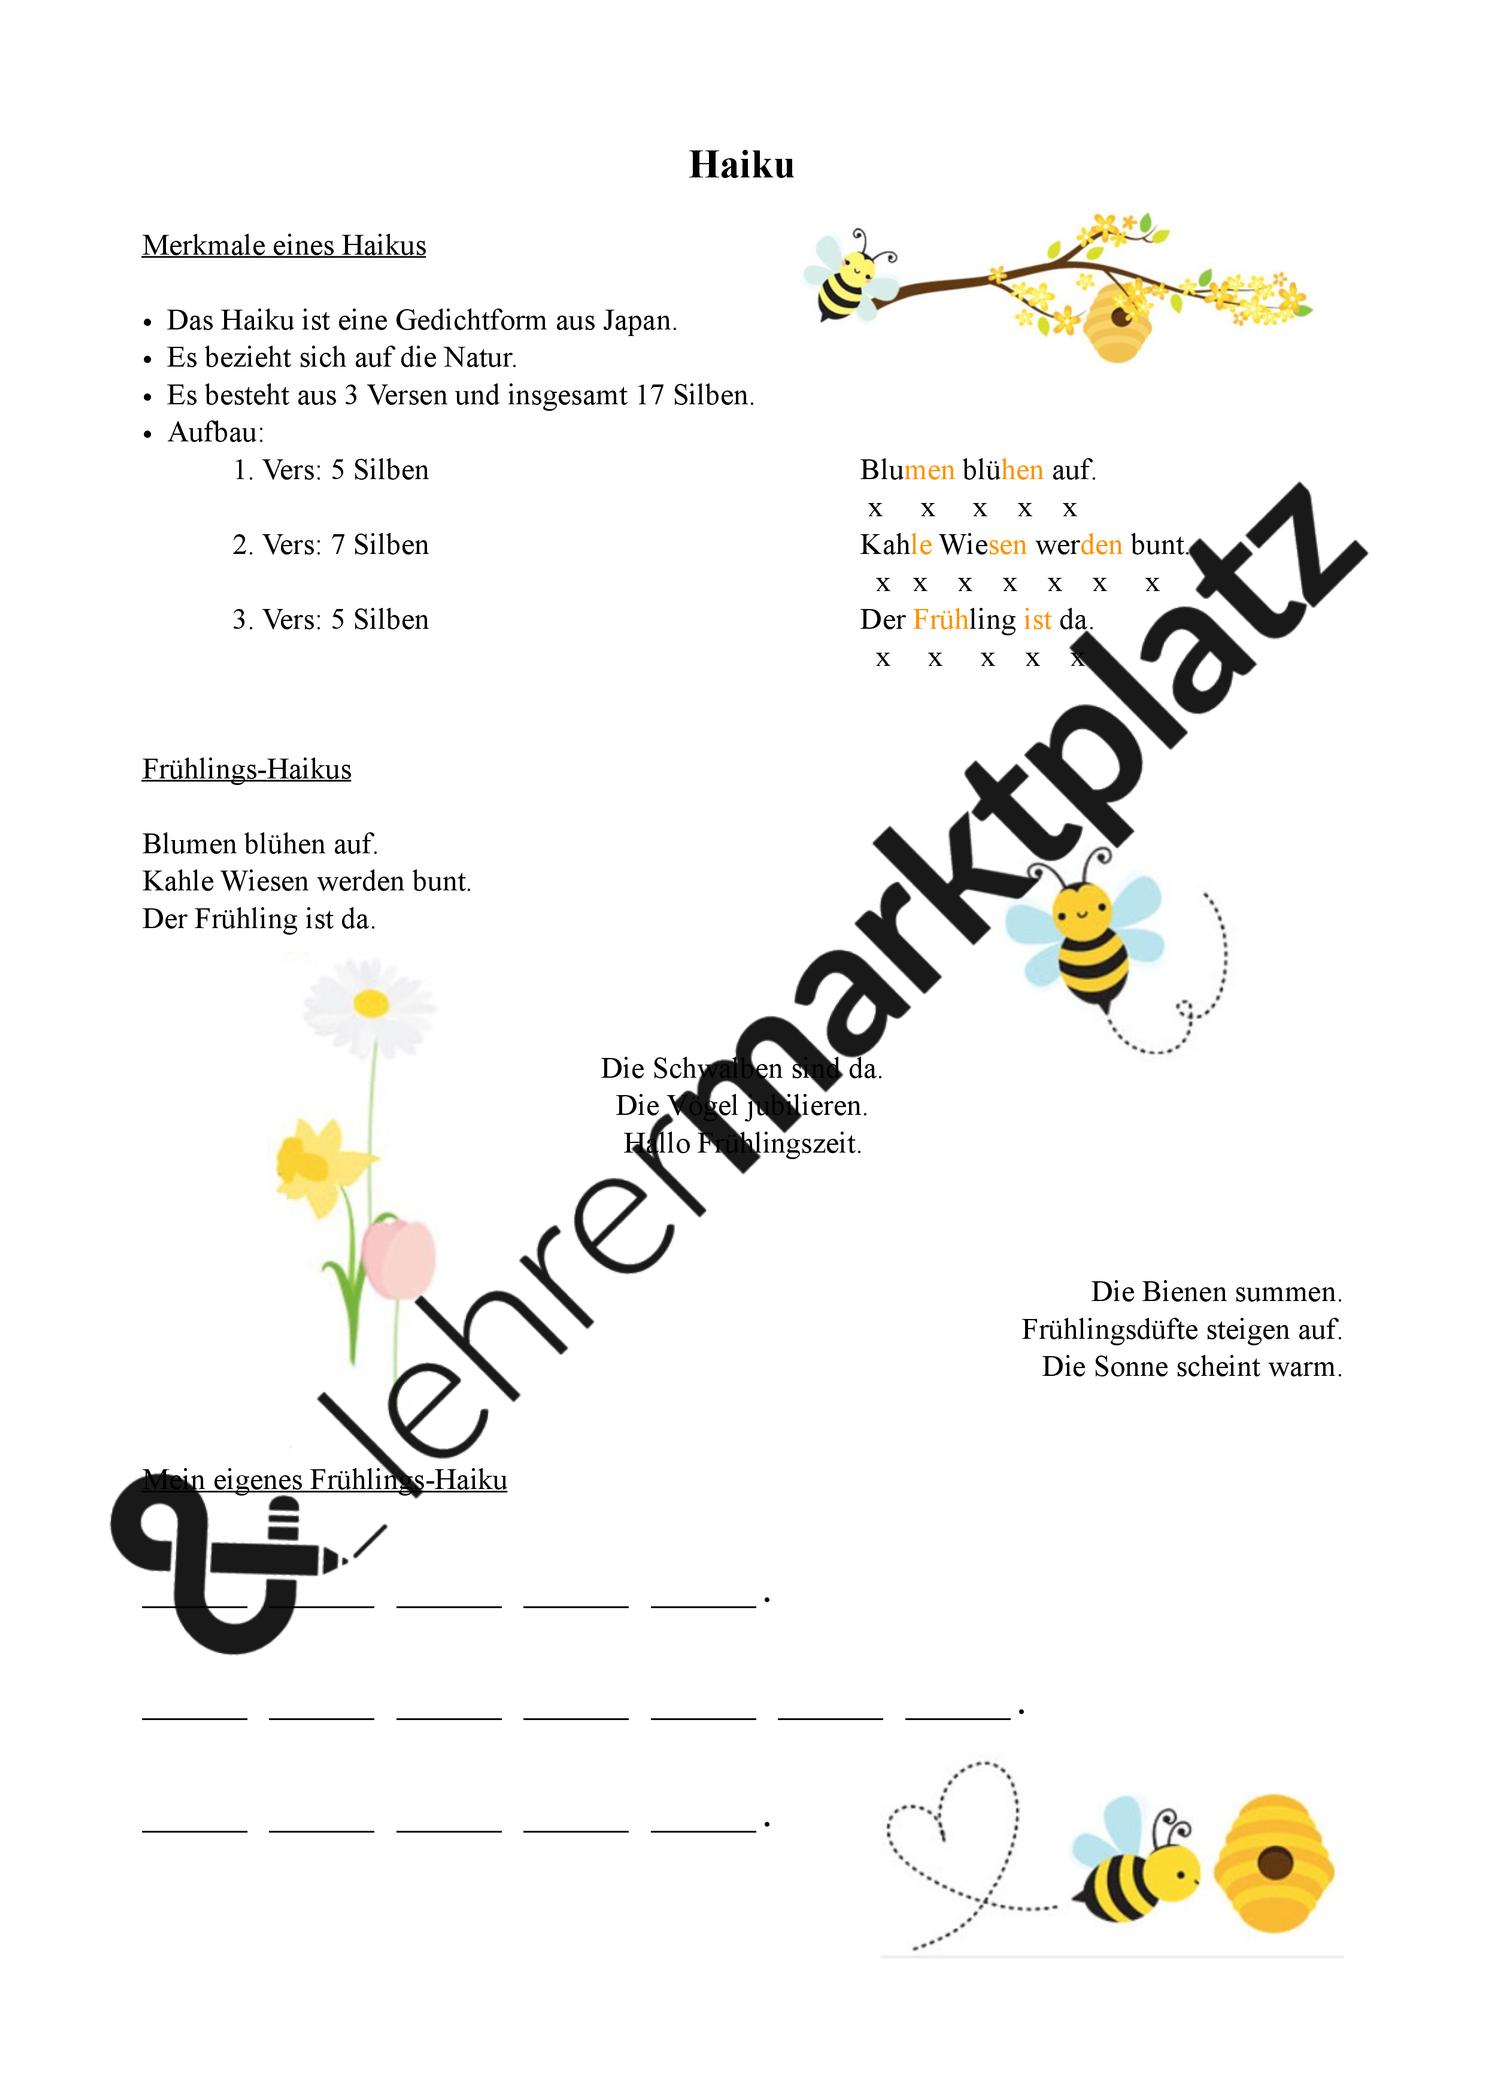 Fruhlings Haiku Unterrichtsmaterial Im Fach Deutsch Haiku Gedichtformen Unterrichtsmaterial